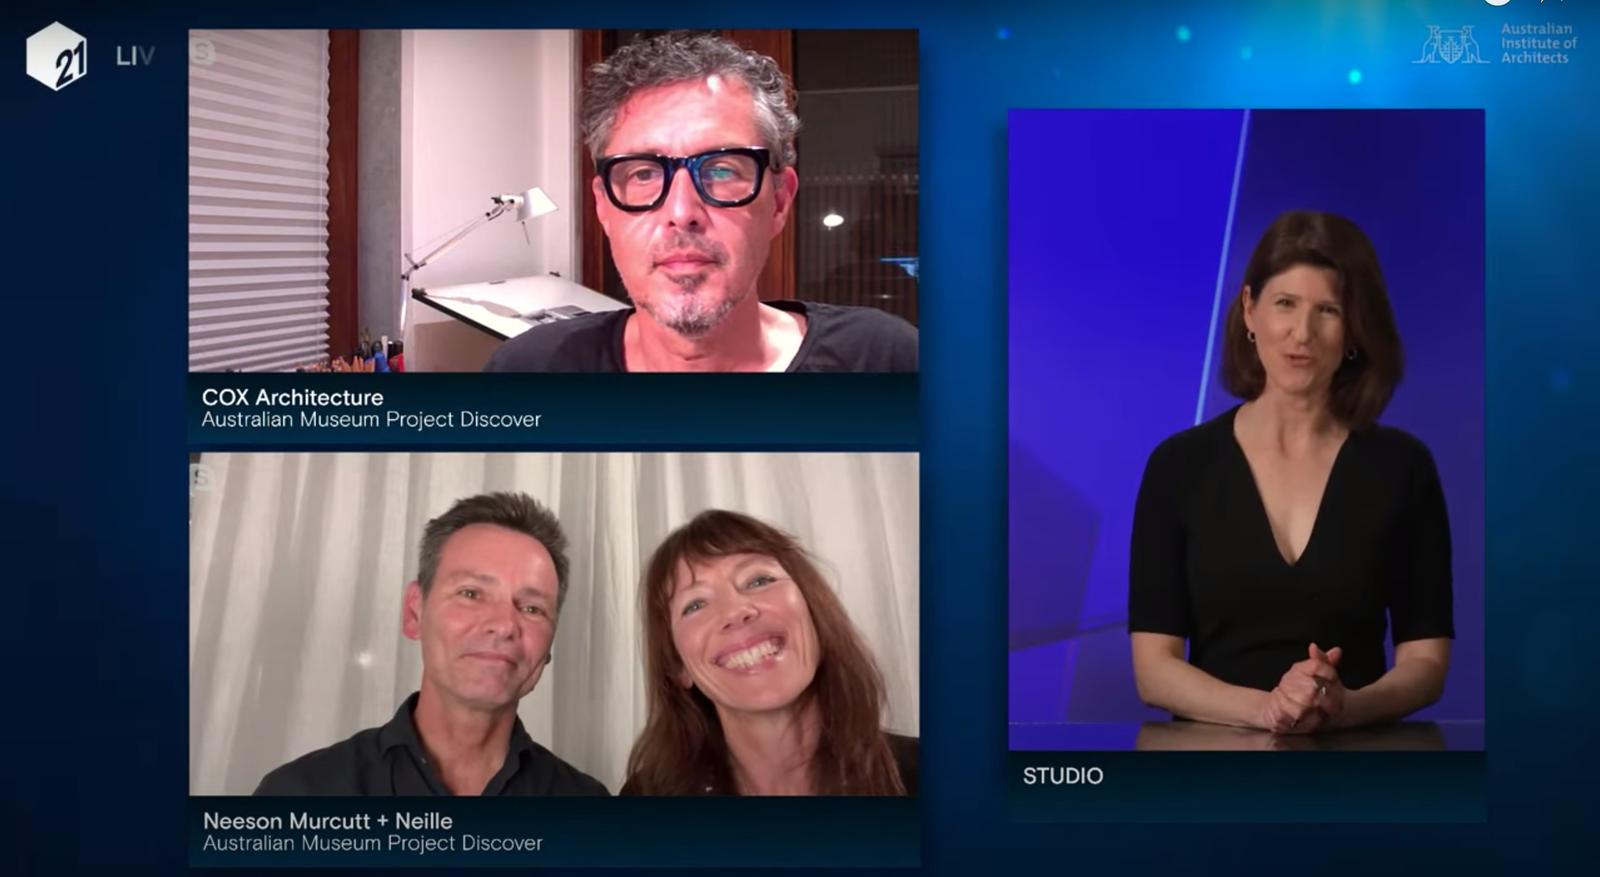 Rachel Neeson, Stephen Neille and Joe Agius from Neeson Murcutt + Neille and Cox Architecture